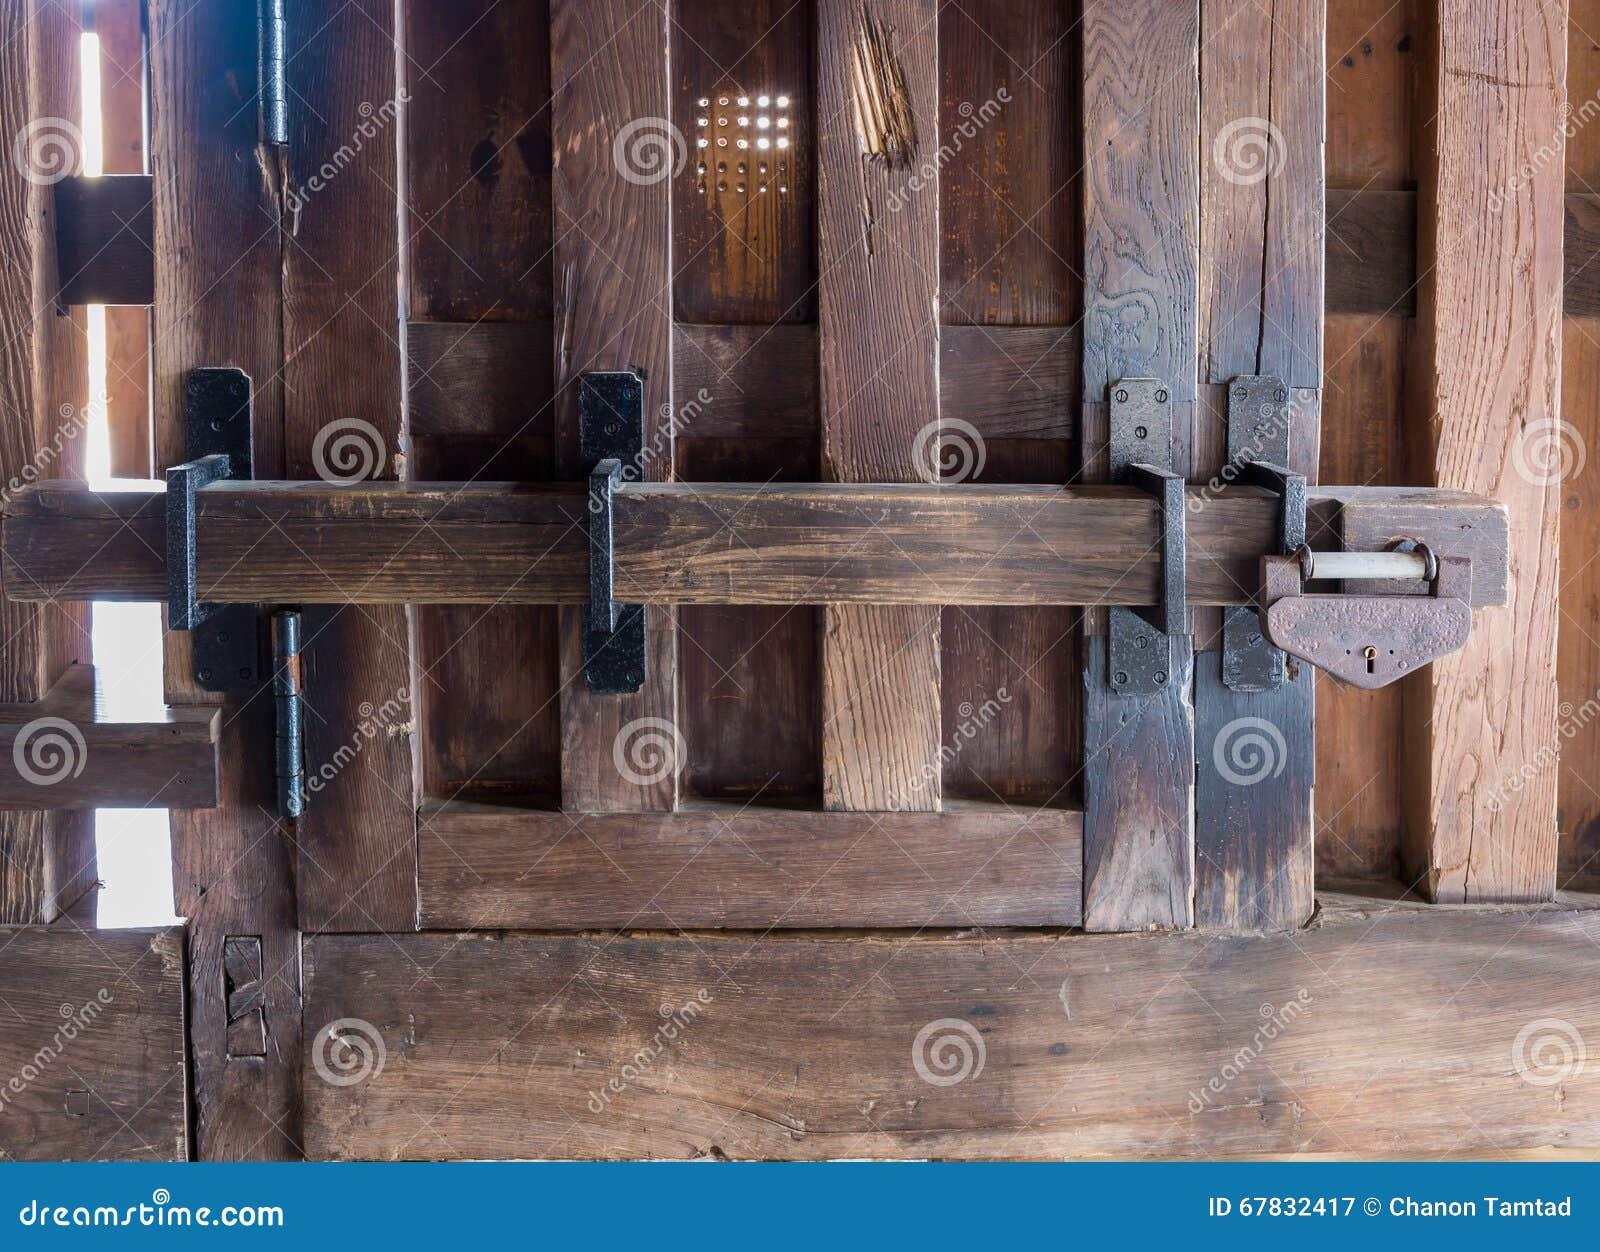 old prison locked wooden key gate lock stock image image 67832417